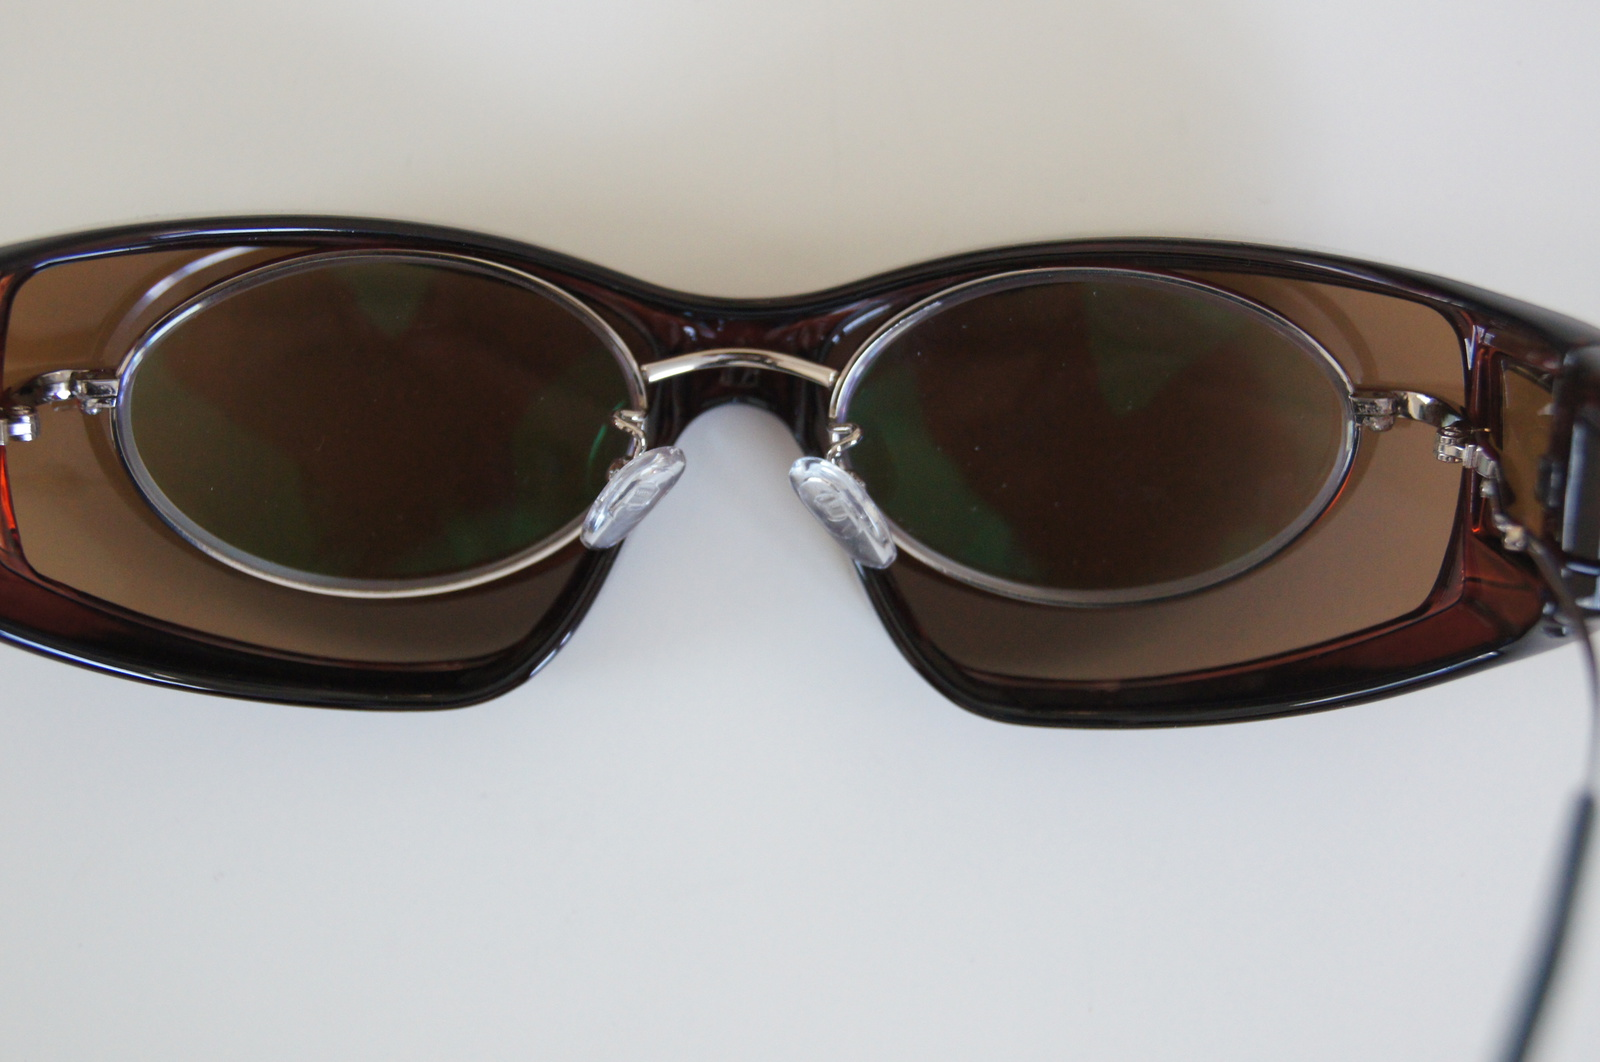 Driving Glasses Amazon Co Uk